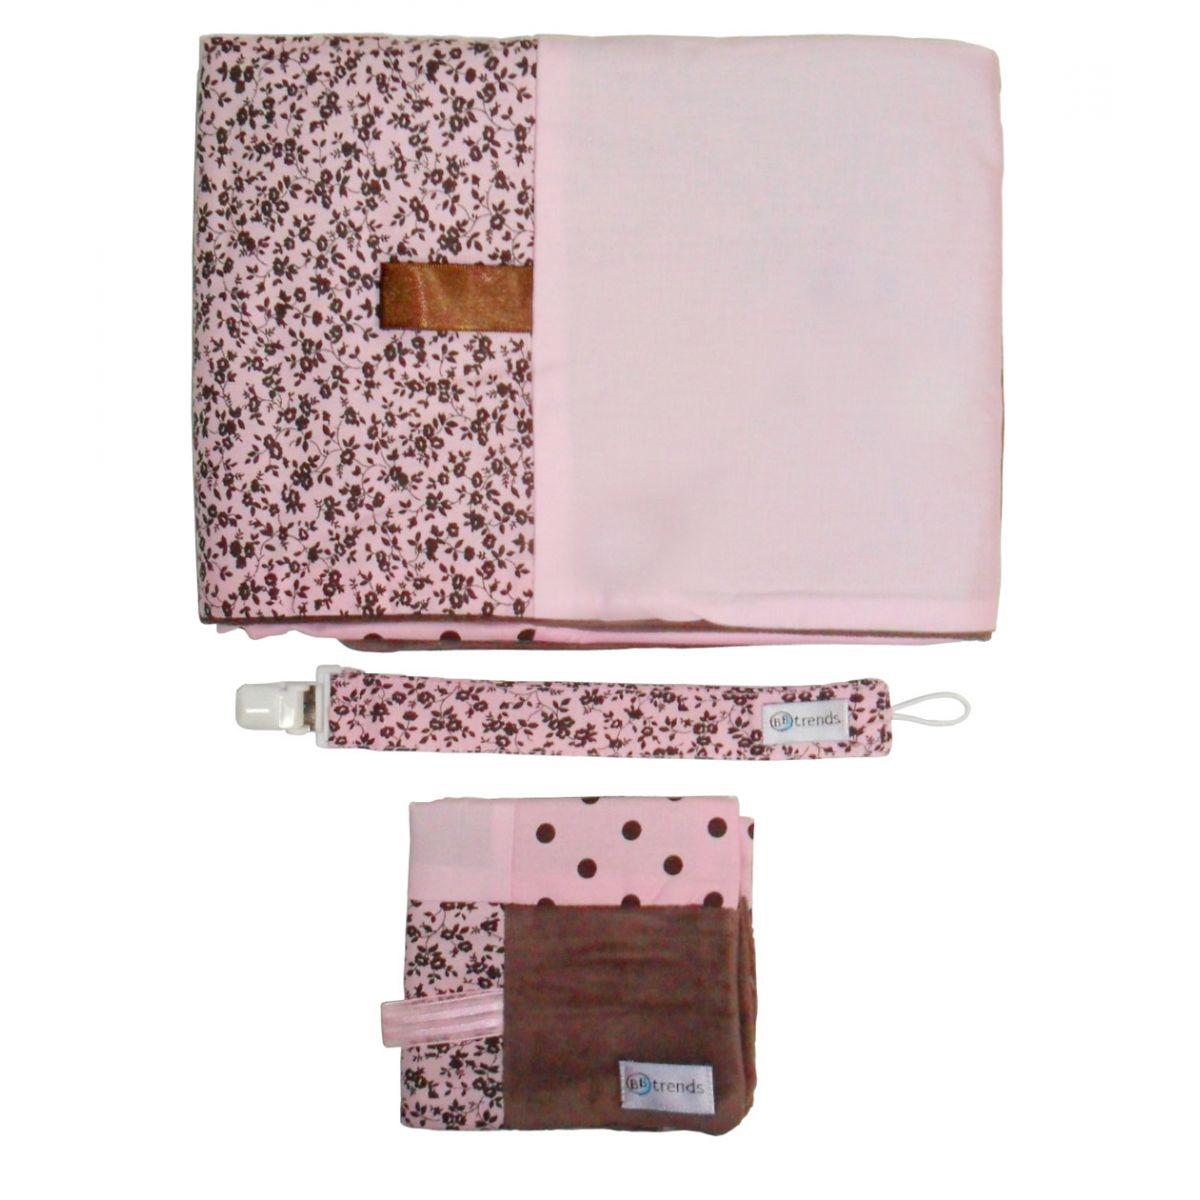 Kit Fashion Rosa - BBtrends